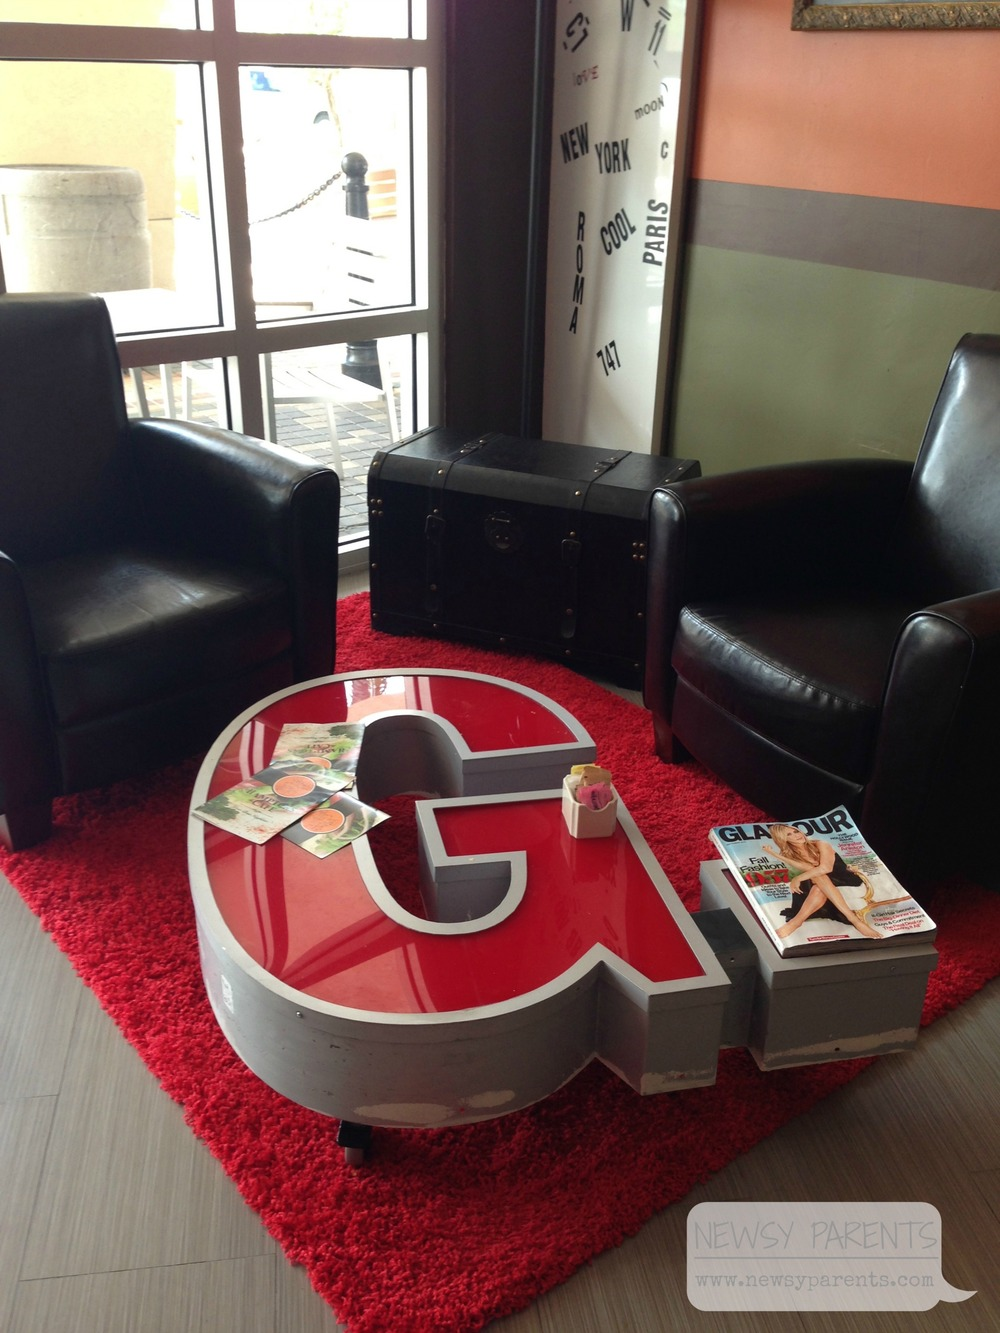 Newsy Parents Hamptons seating.jpg